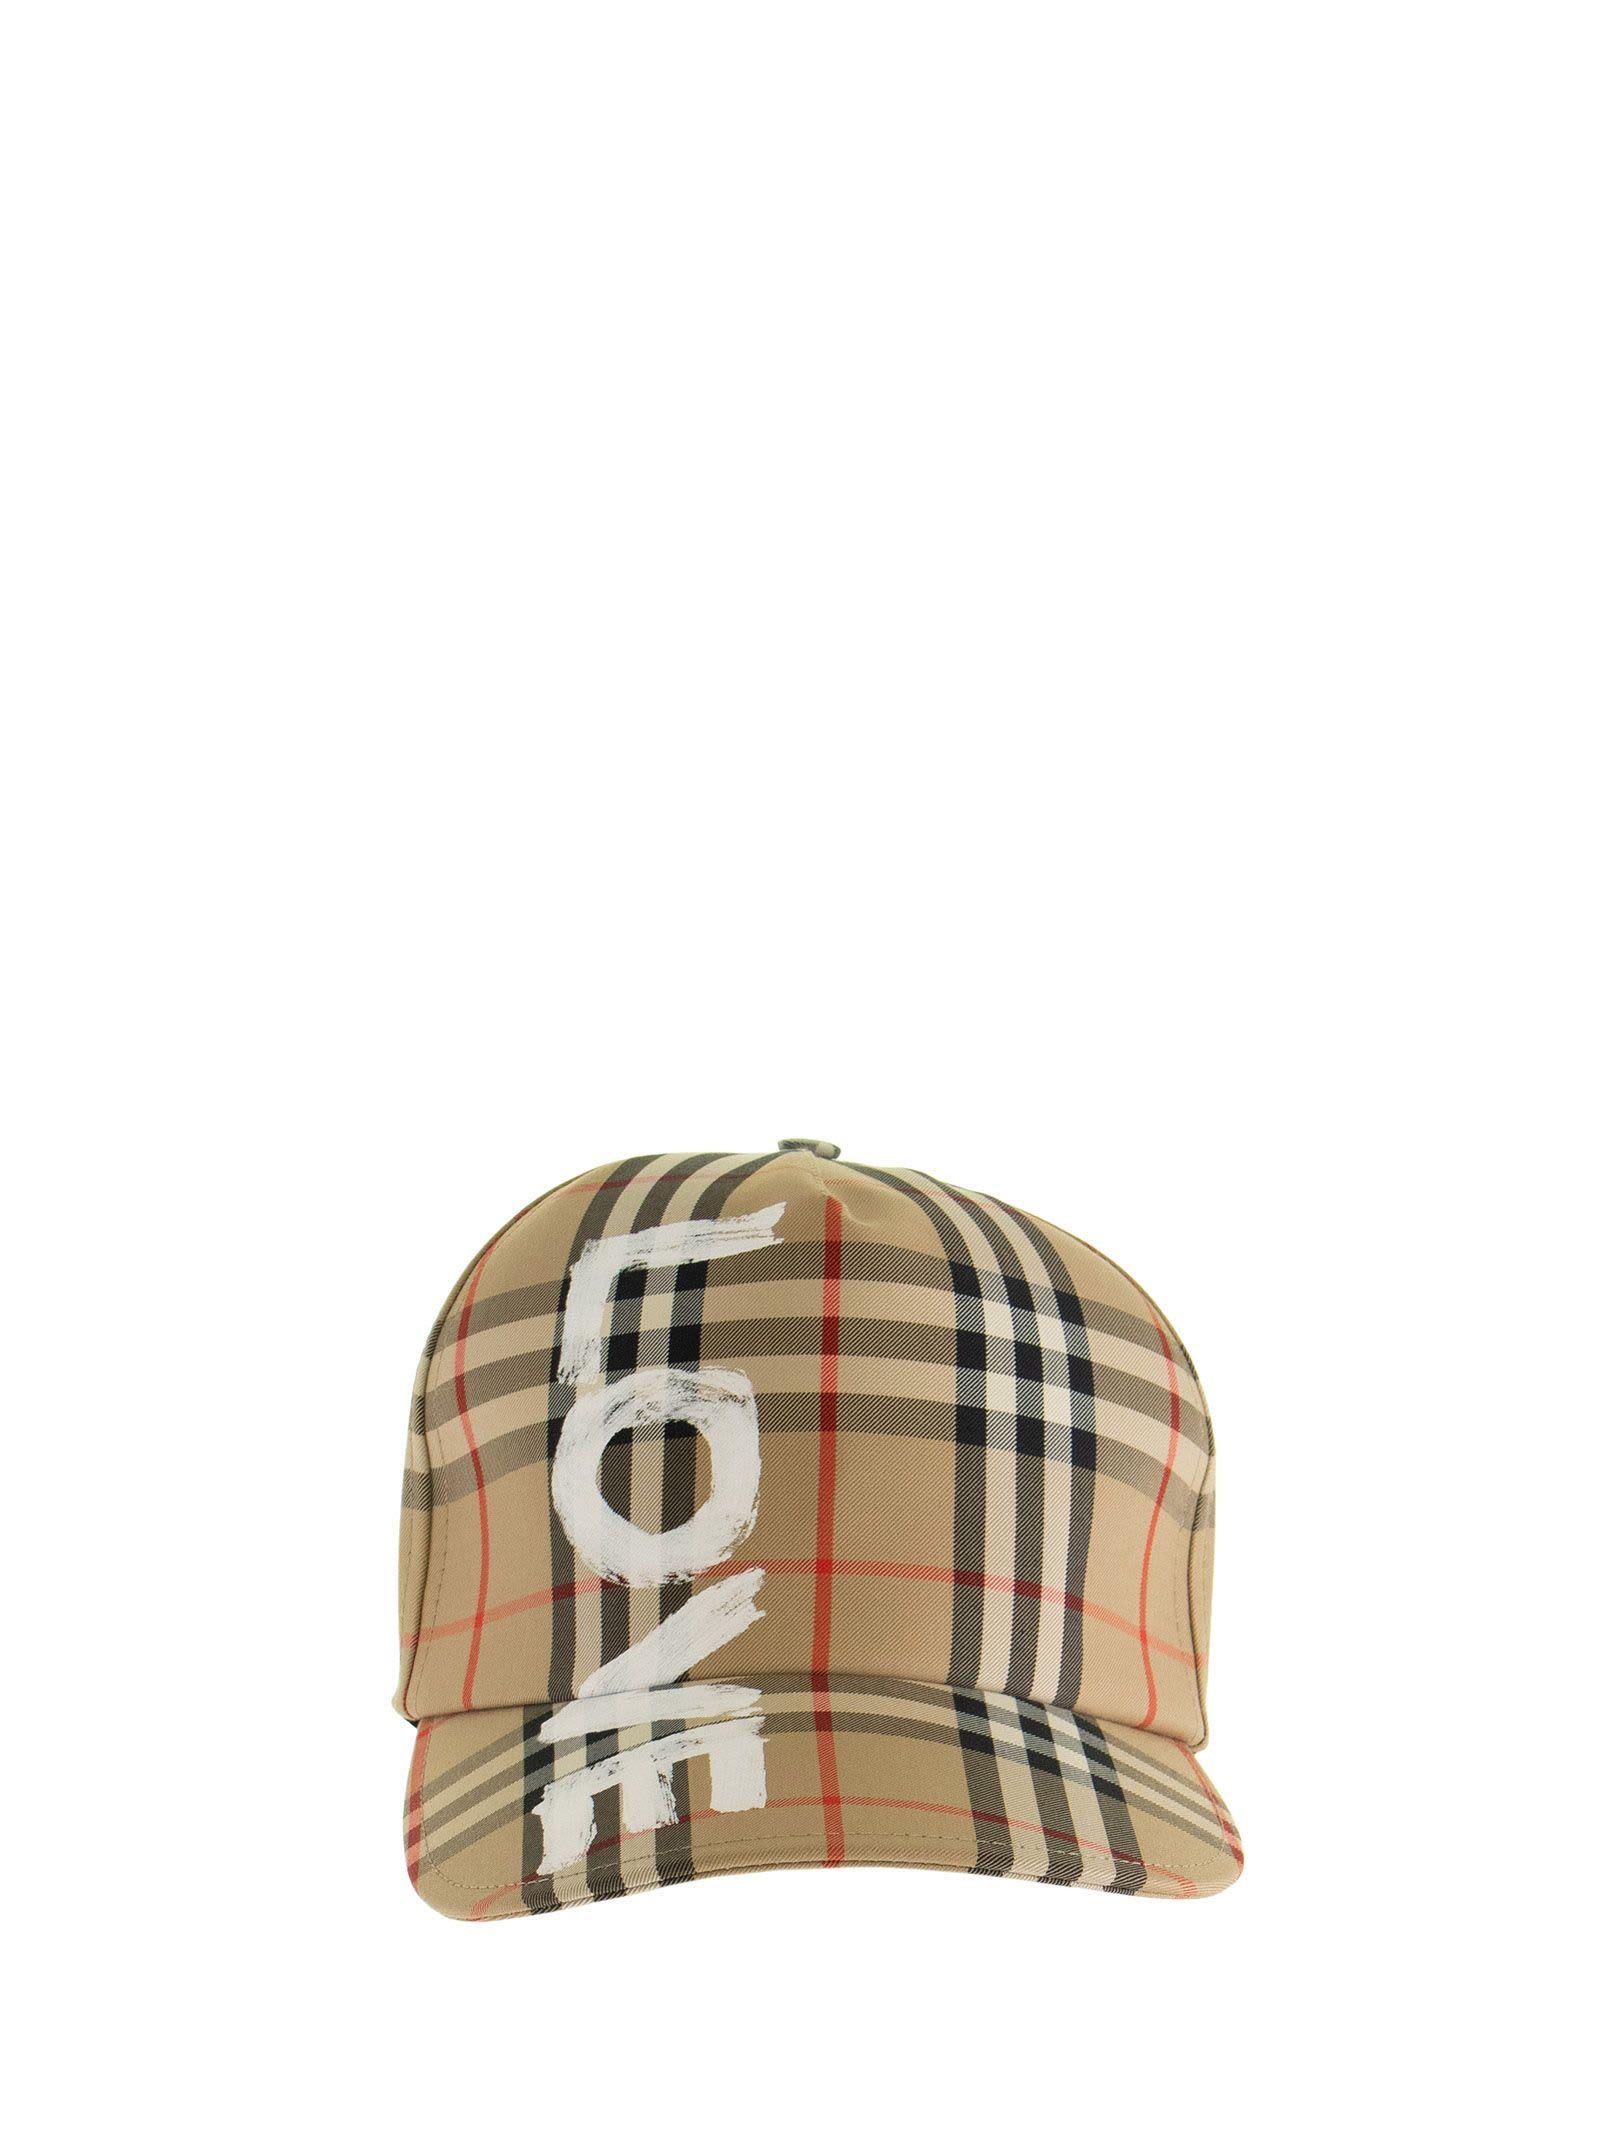 Burberry Caps LOVE PRINT VINTAGE CHECK BASEBALL CAP